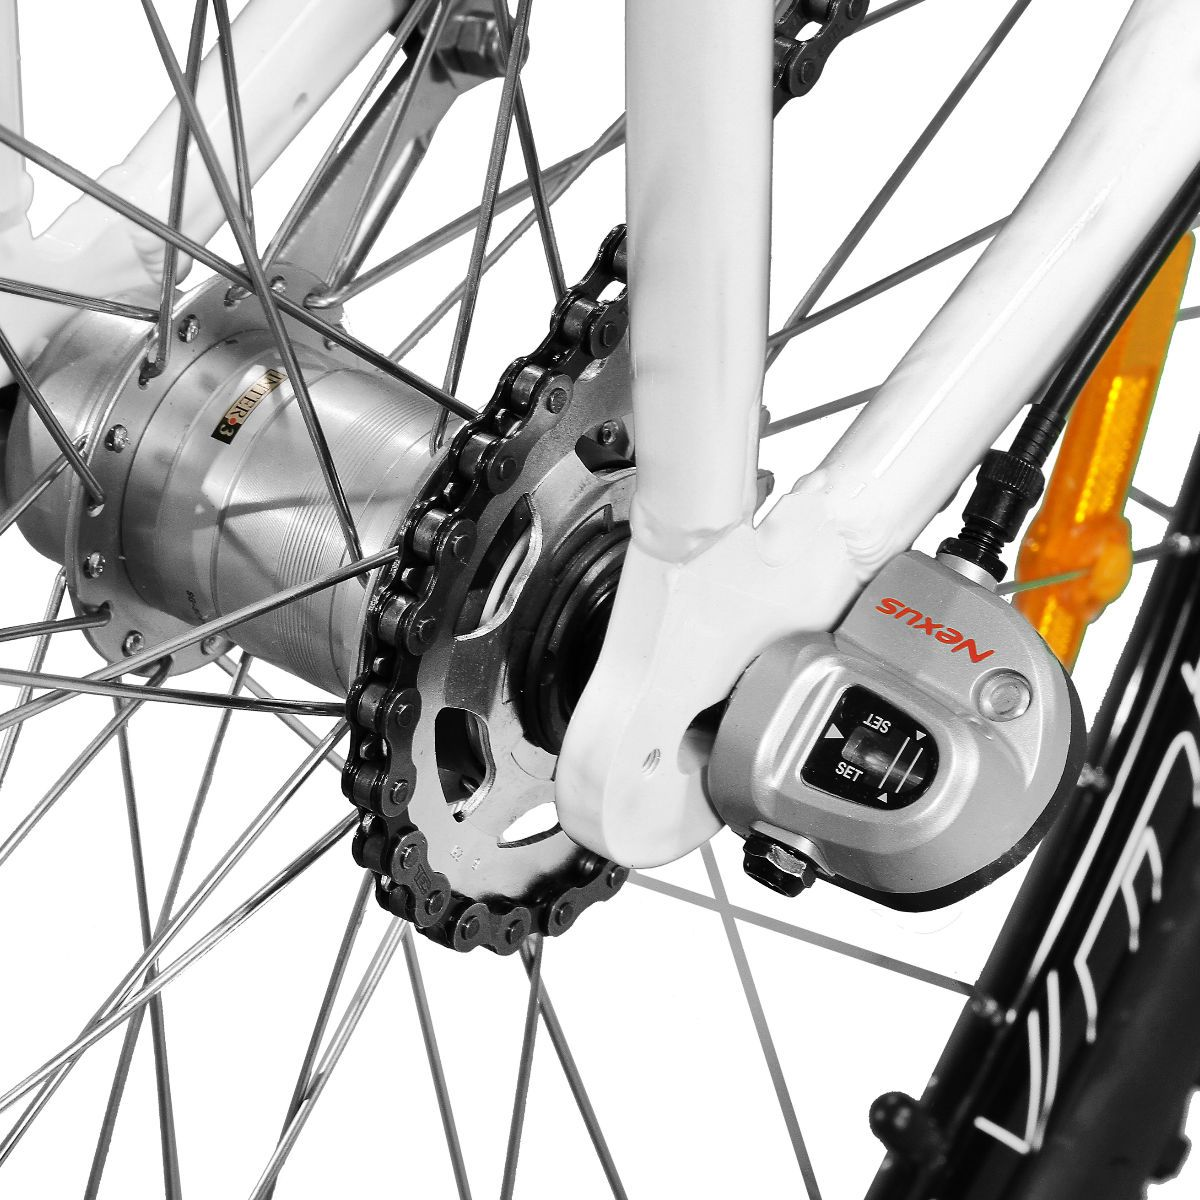 Bicicleta Master Bike Aro 29 Urbis Freio à Disco 3 V Nexus C/ Cesta Branco